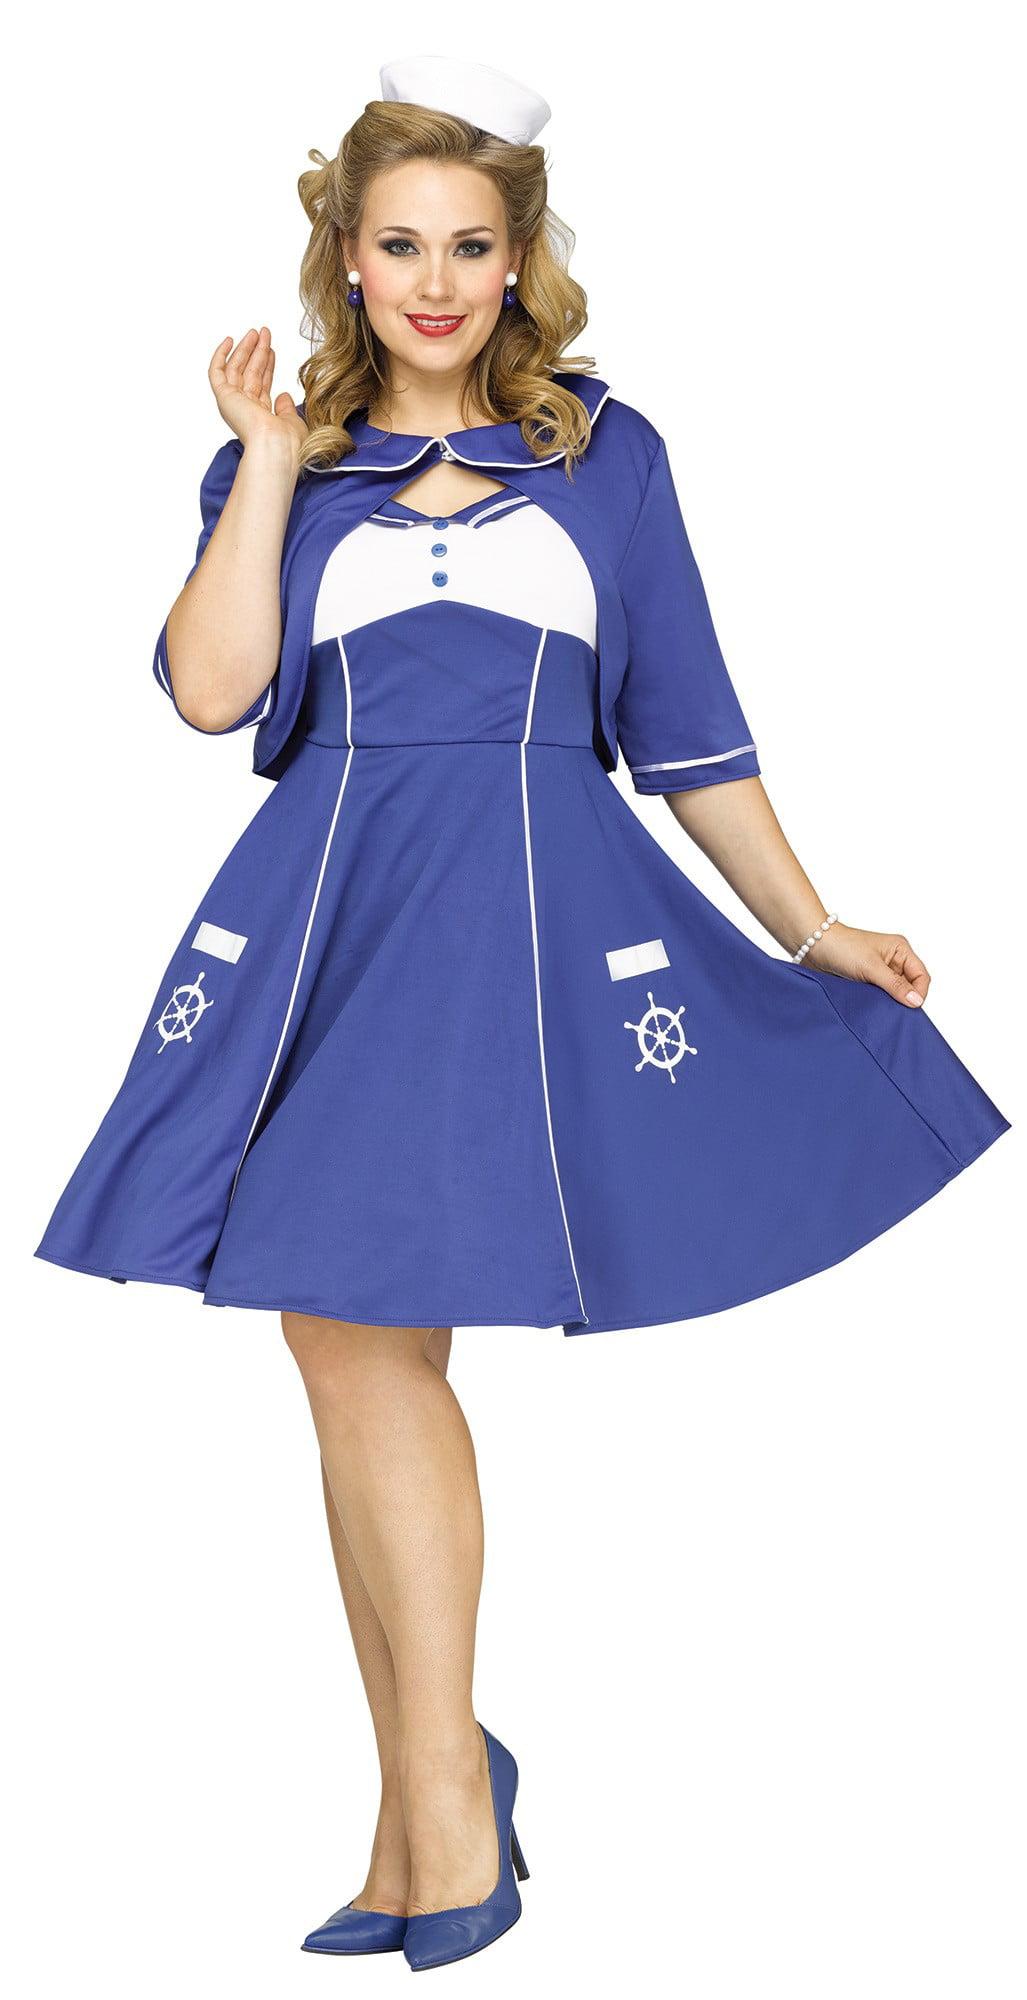 e67eb42904d Sweet Sailin  Sailor Dress Plus Size Women s Costume 40s-50s Retro Swing  1X-2X